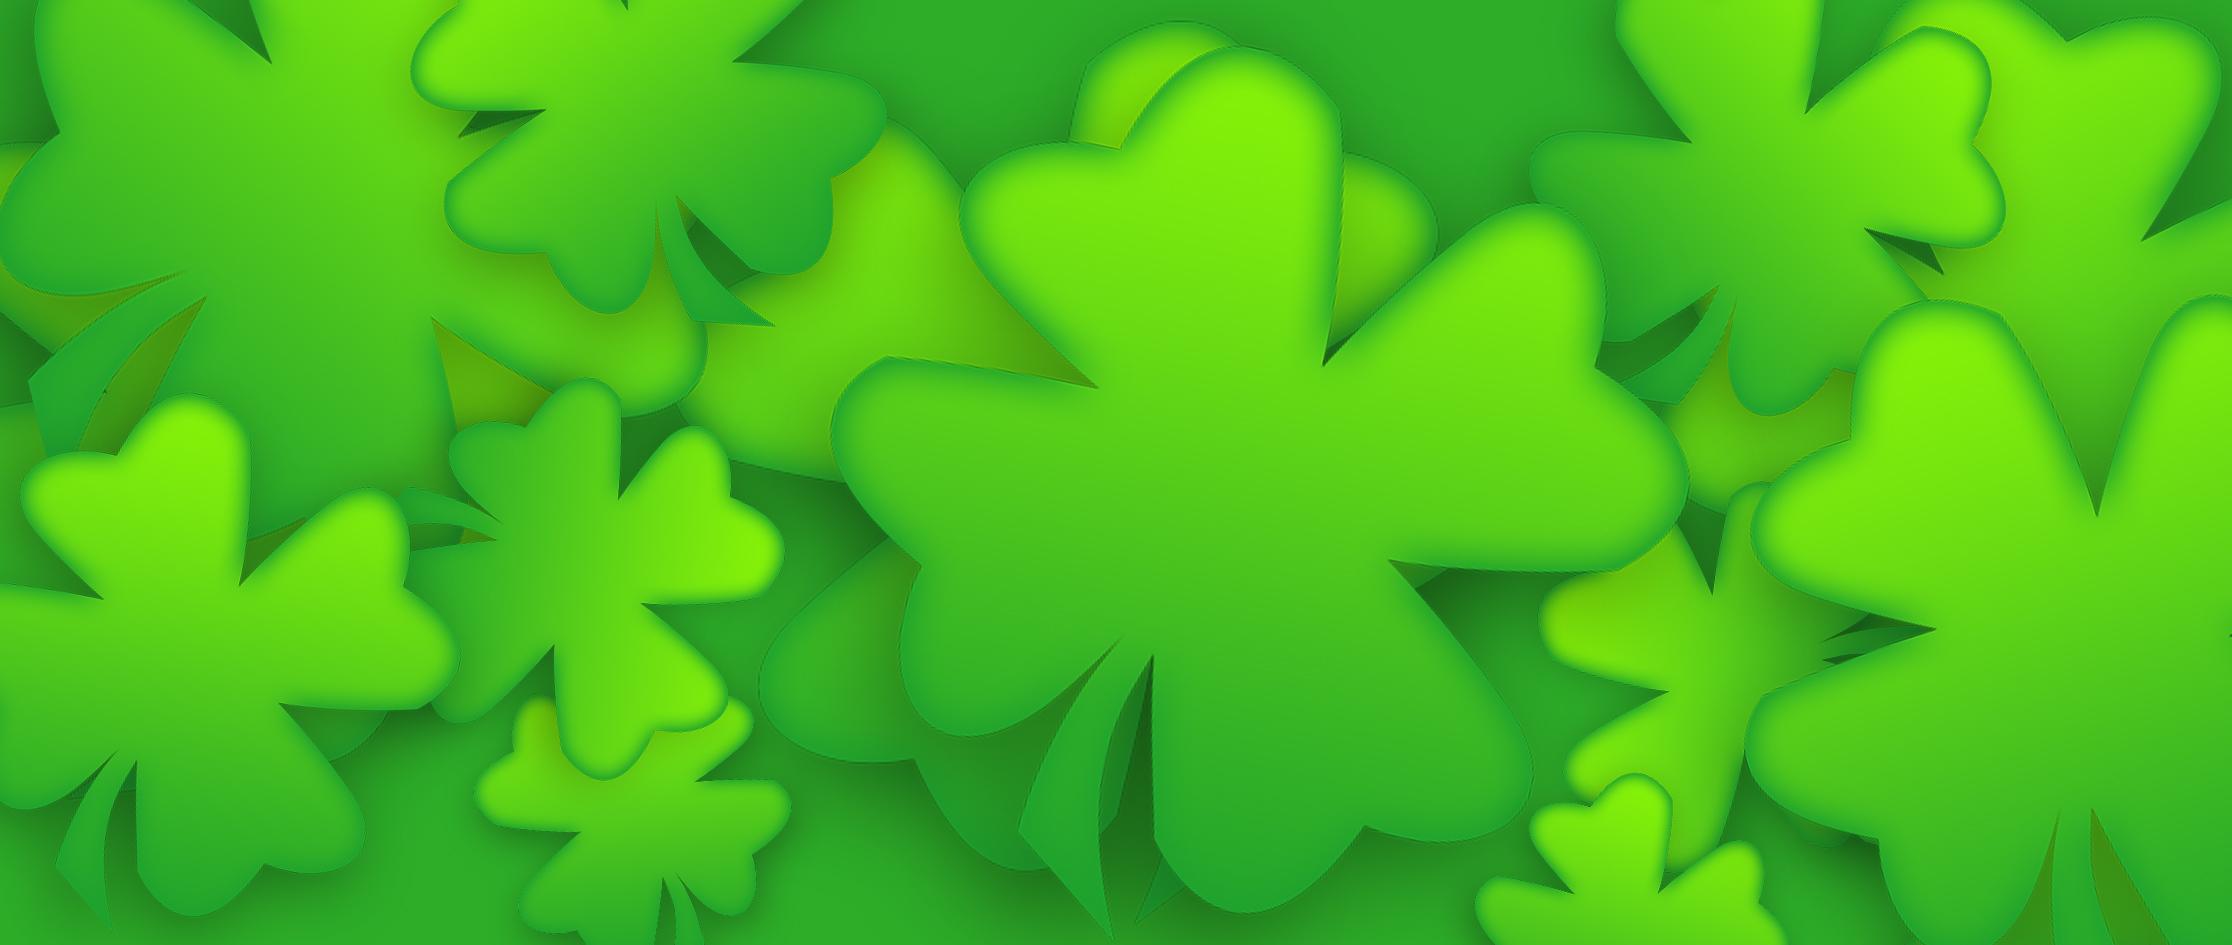 St. Patricks Day <span>17.03.2018</span>